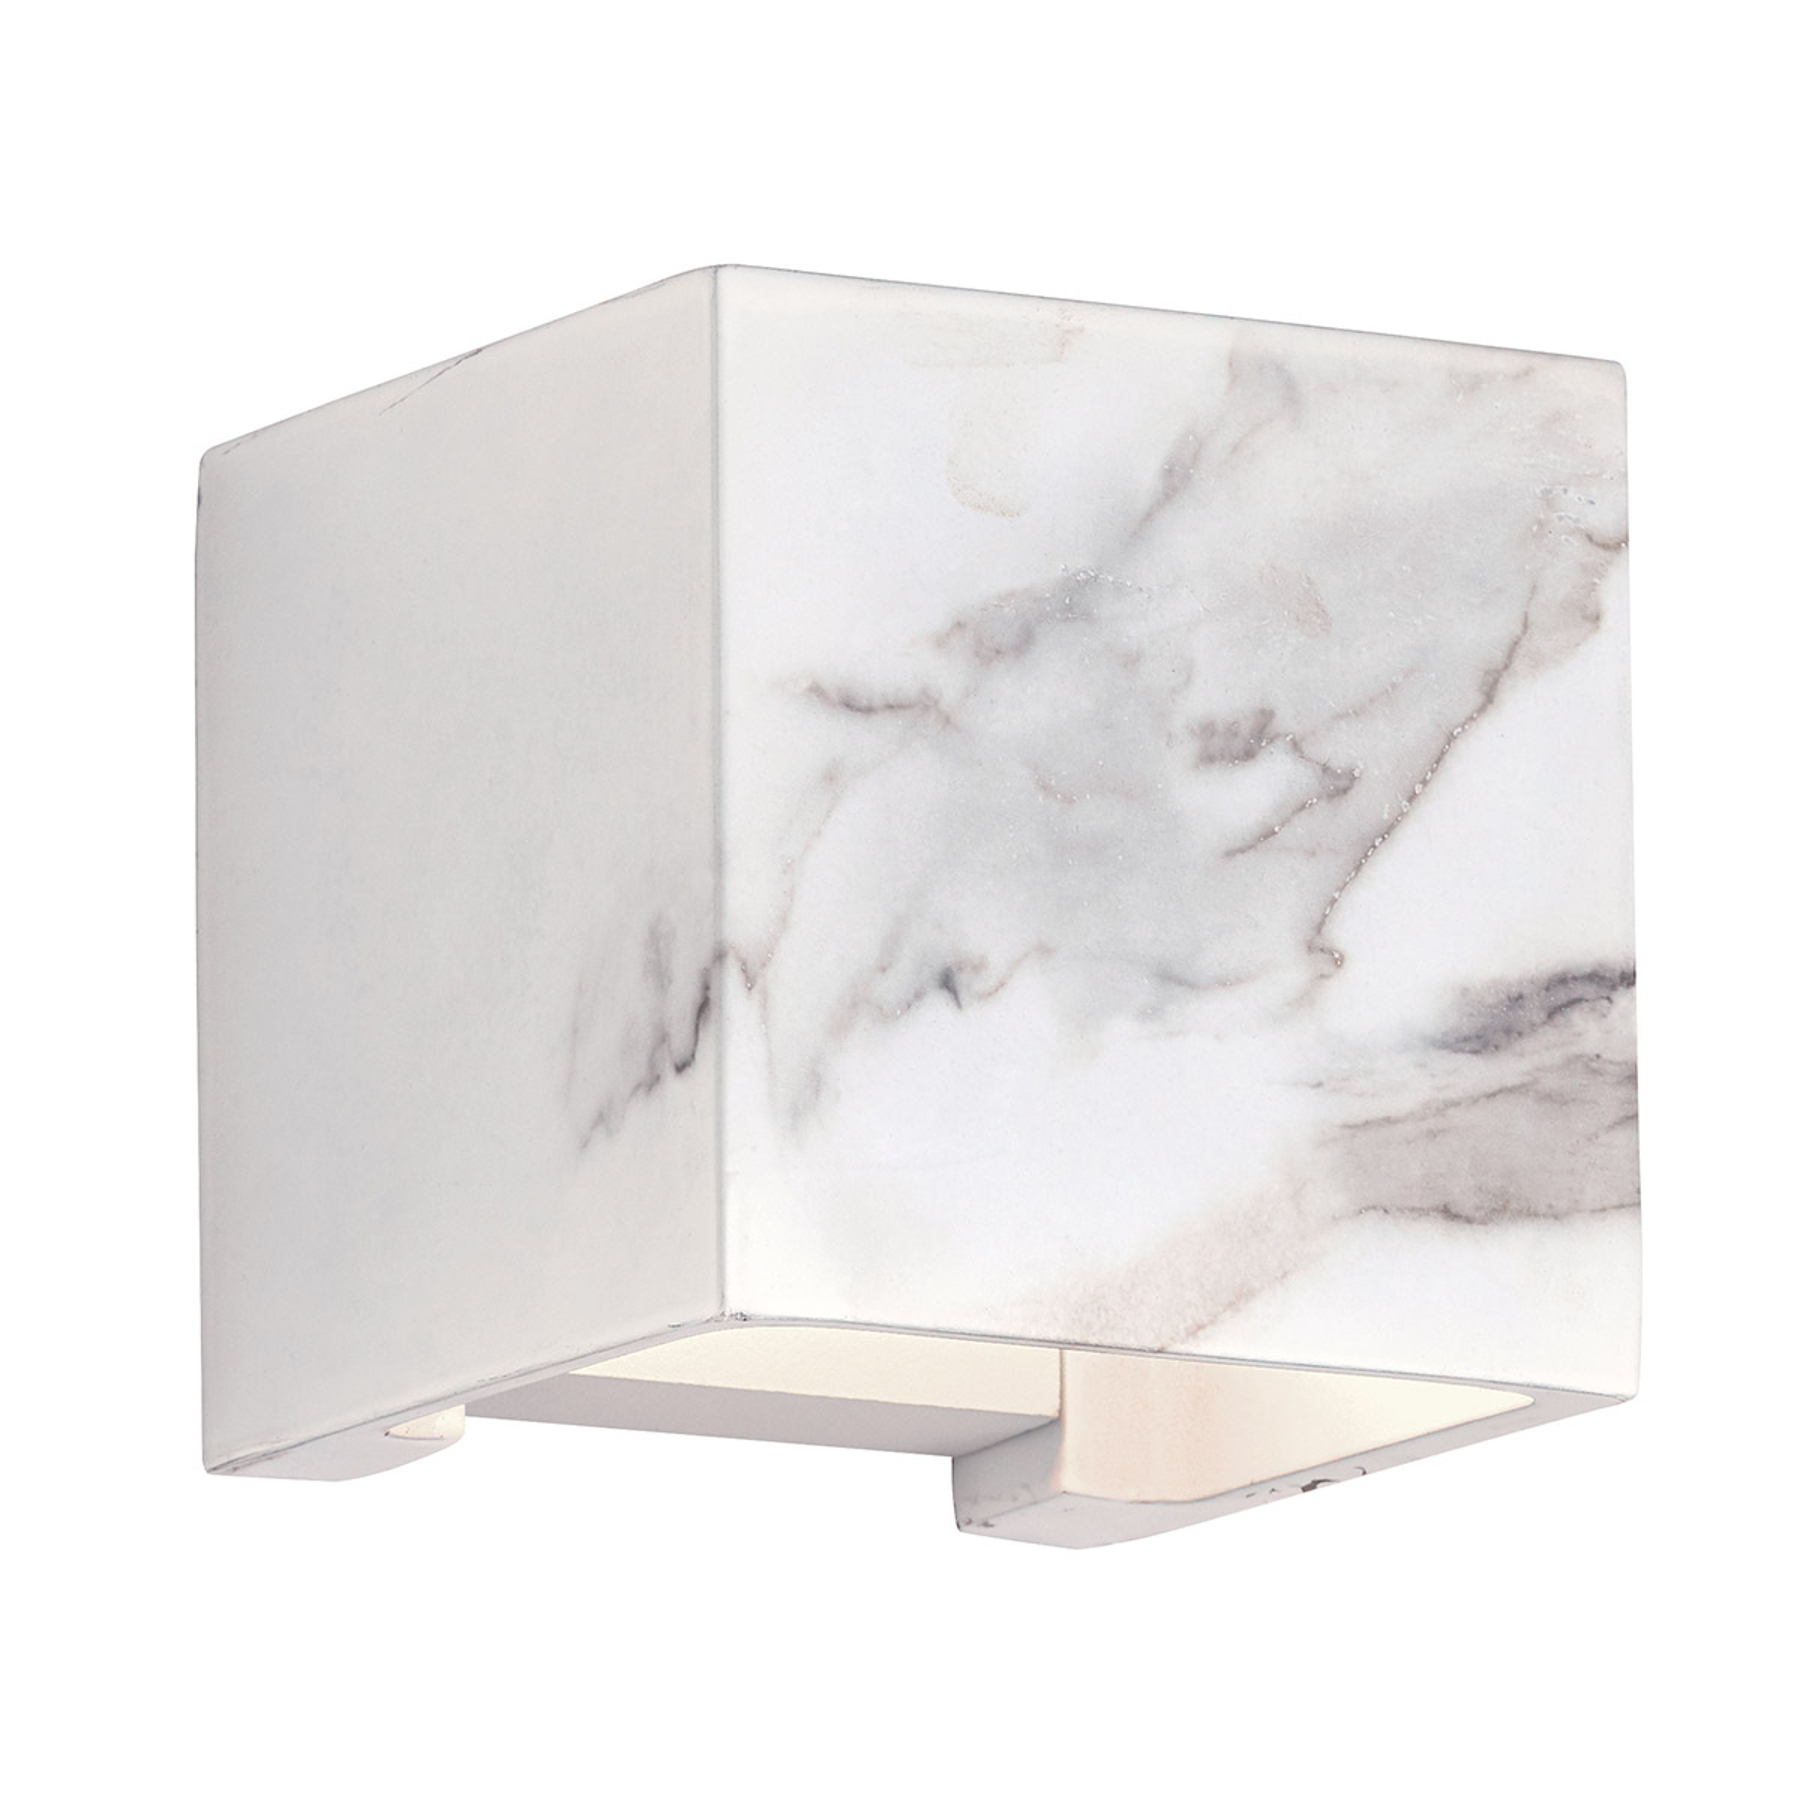 LED buitenwandlamp Davos met marmerdecor wit